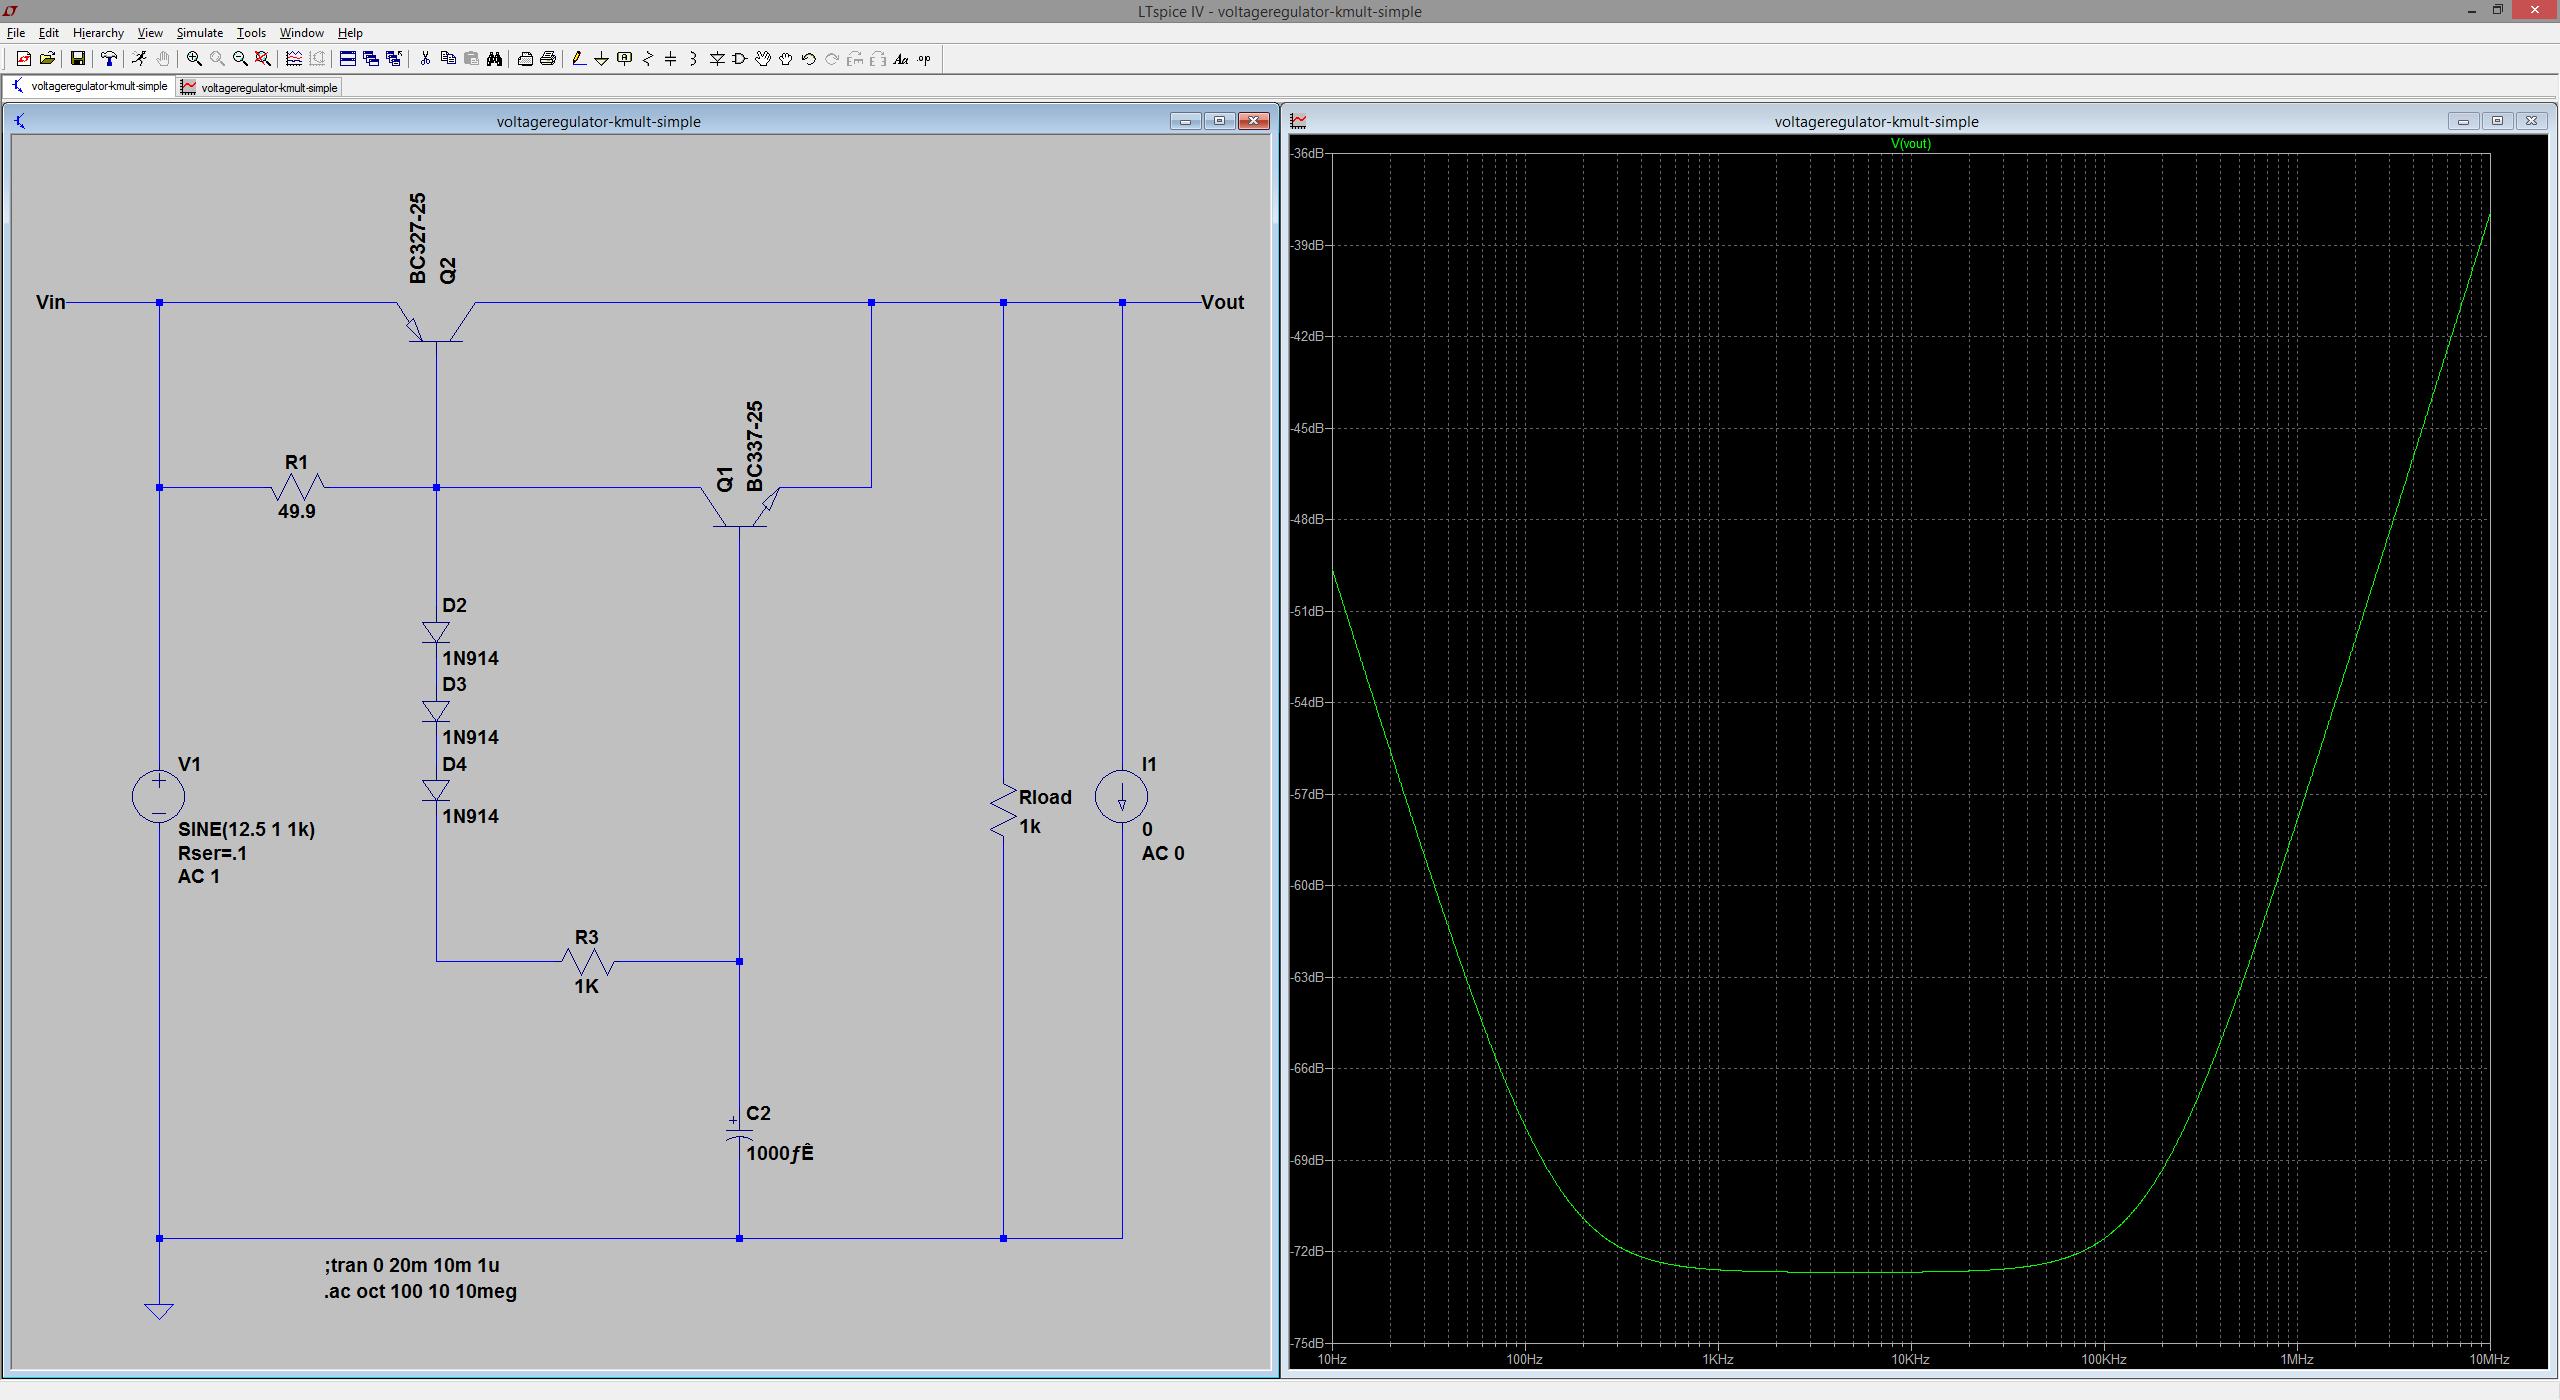 Diyaudio Voltage Regulators 12 Volt Regulator Circuit Diagram Also Lm317 For Line Level Audio Part Vii The K Multiplier